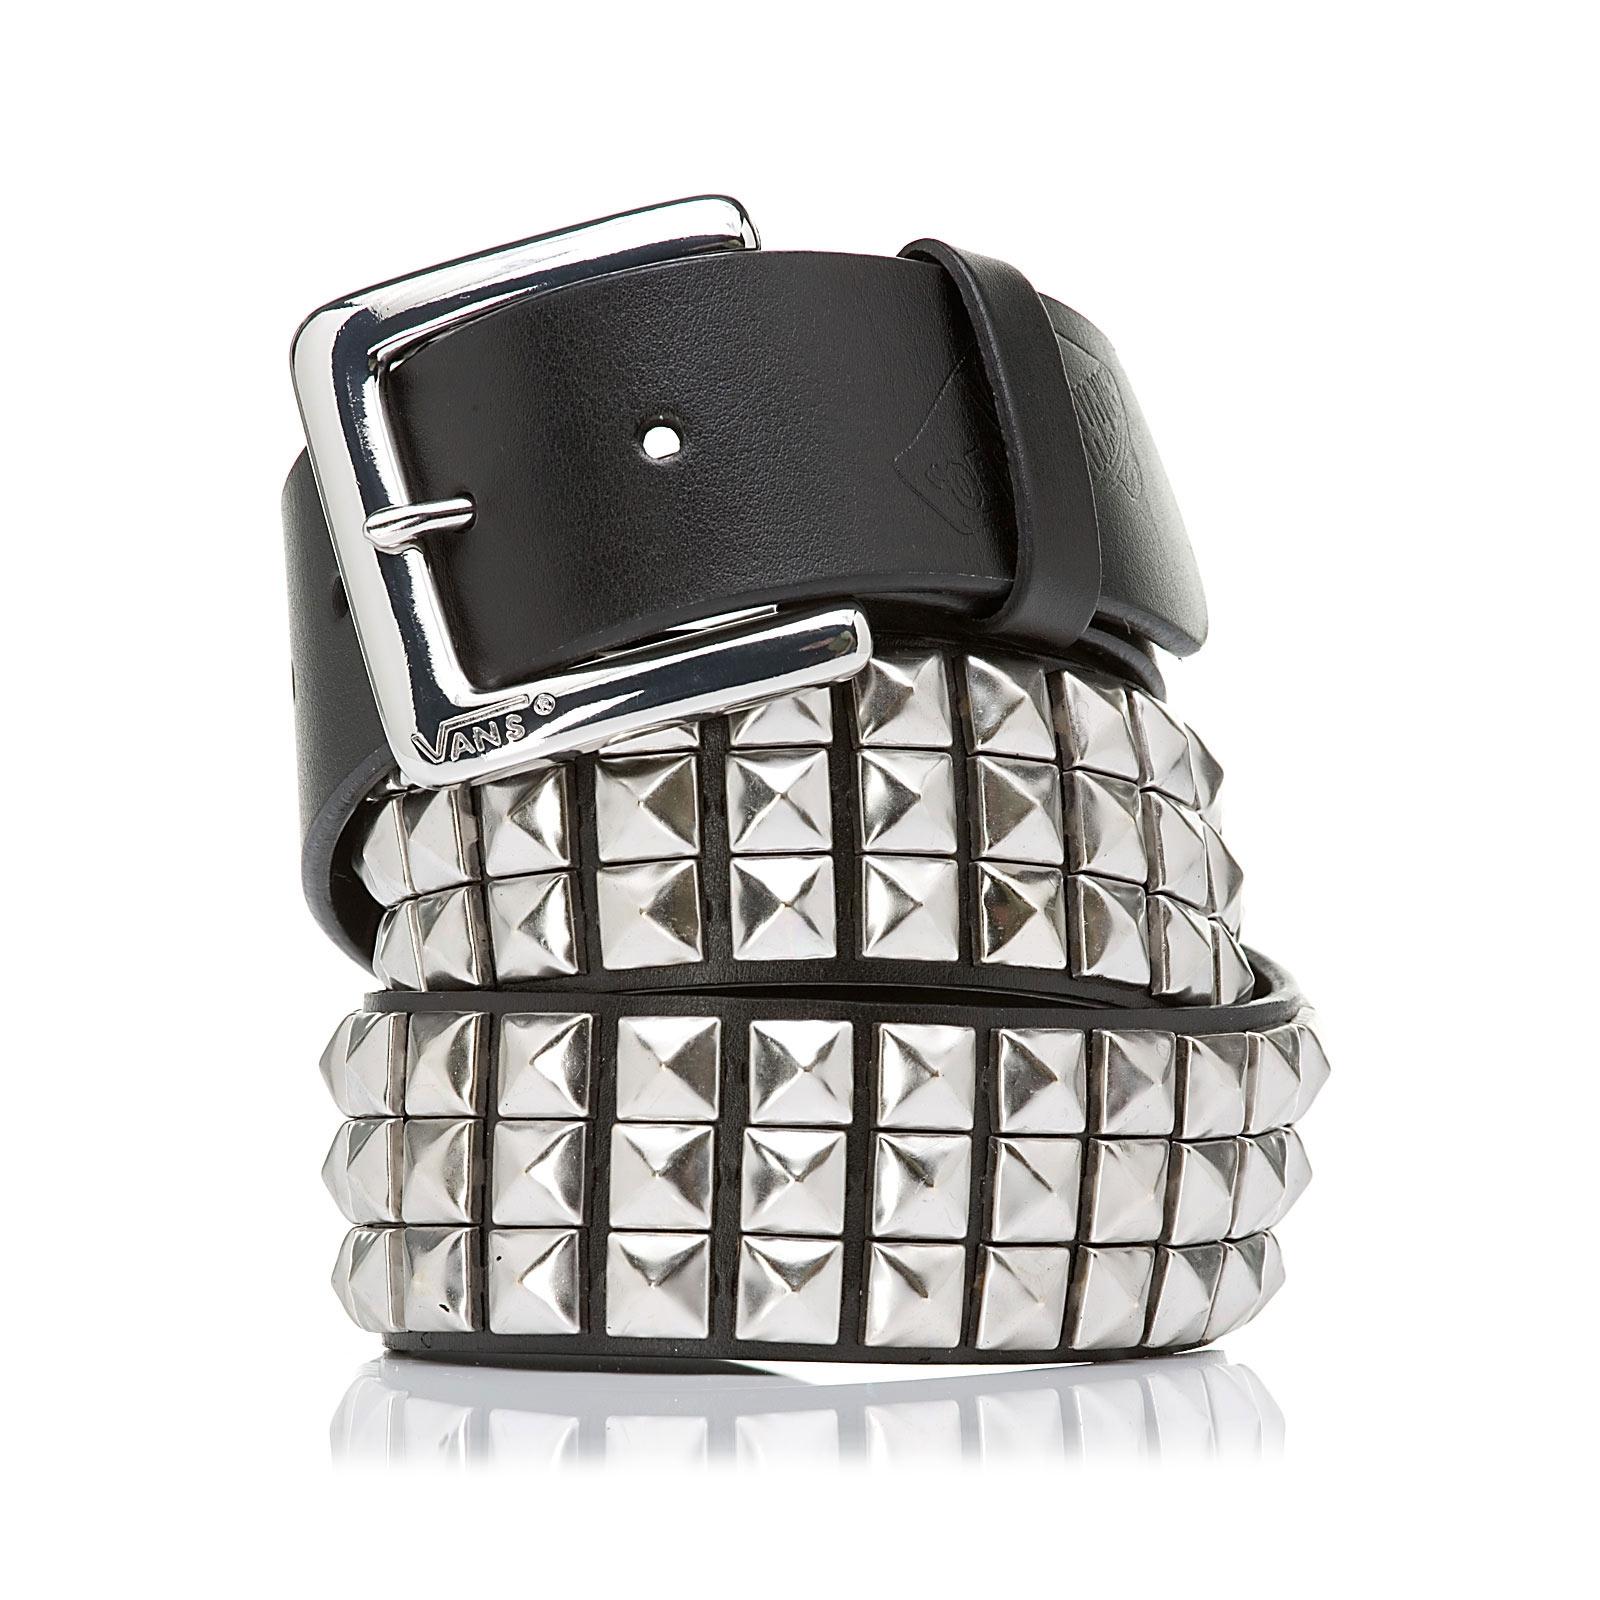 0b53a00bd5 Vans Studded Leather Belt Eu black silver